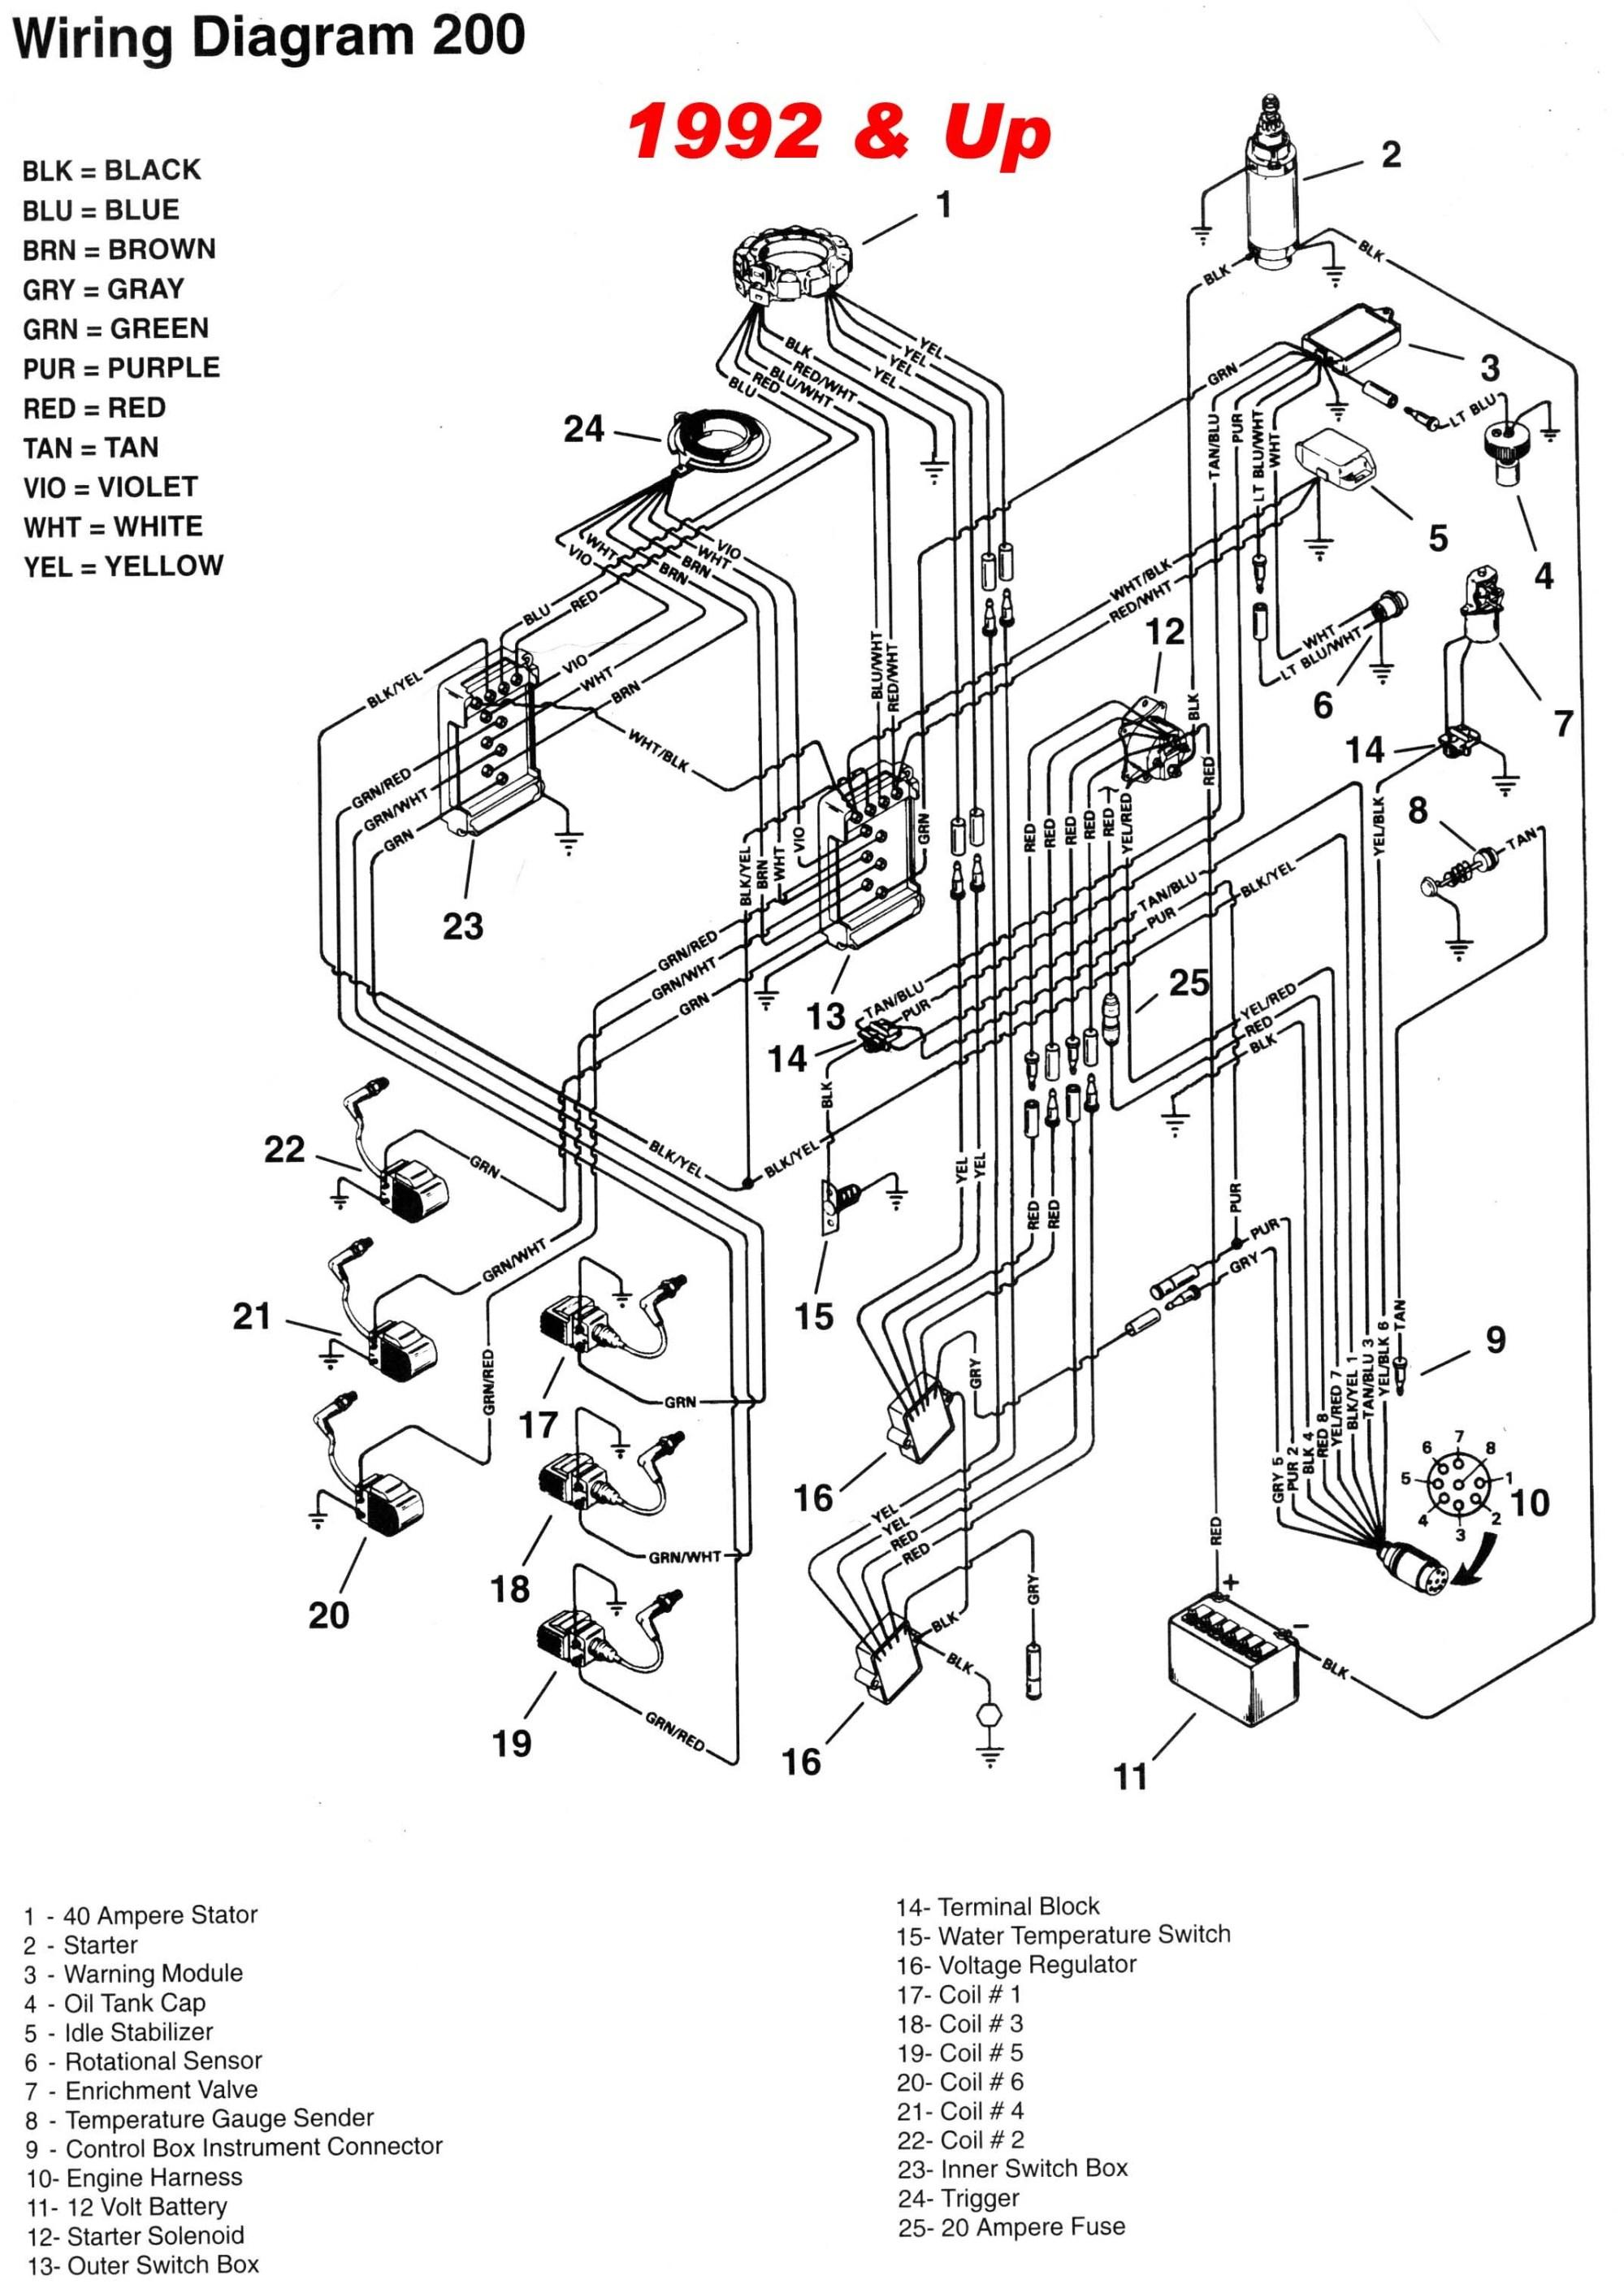 hight resolution of 49cc 2 stroke wiring diagram rgo248ri dietistvanderschaaf nl u202249cc engine diagram wiring diagram rh 03